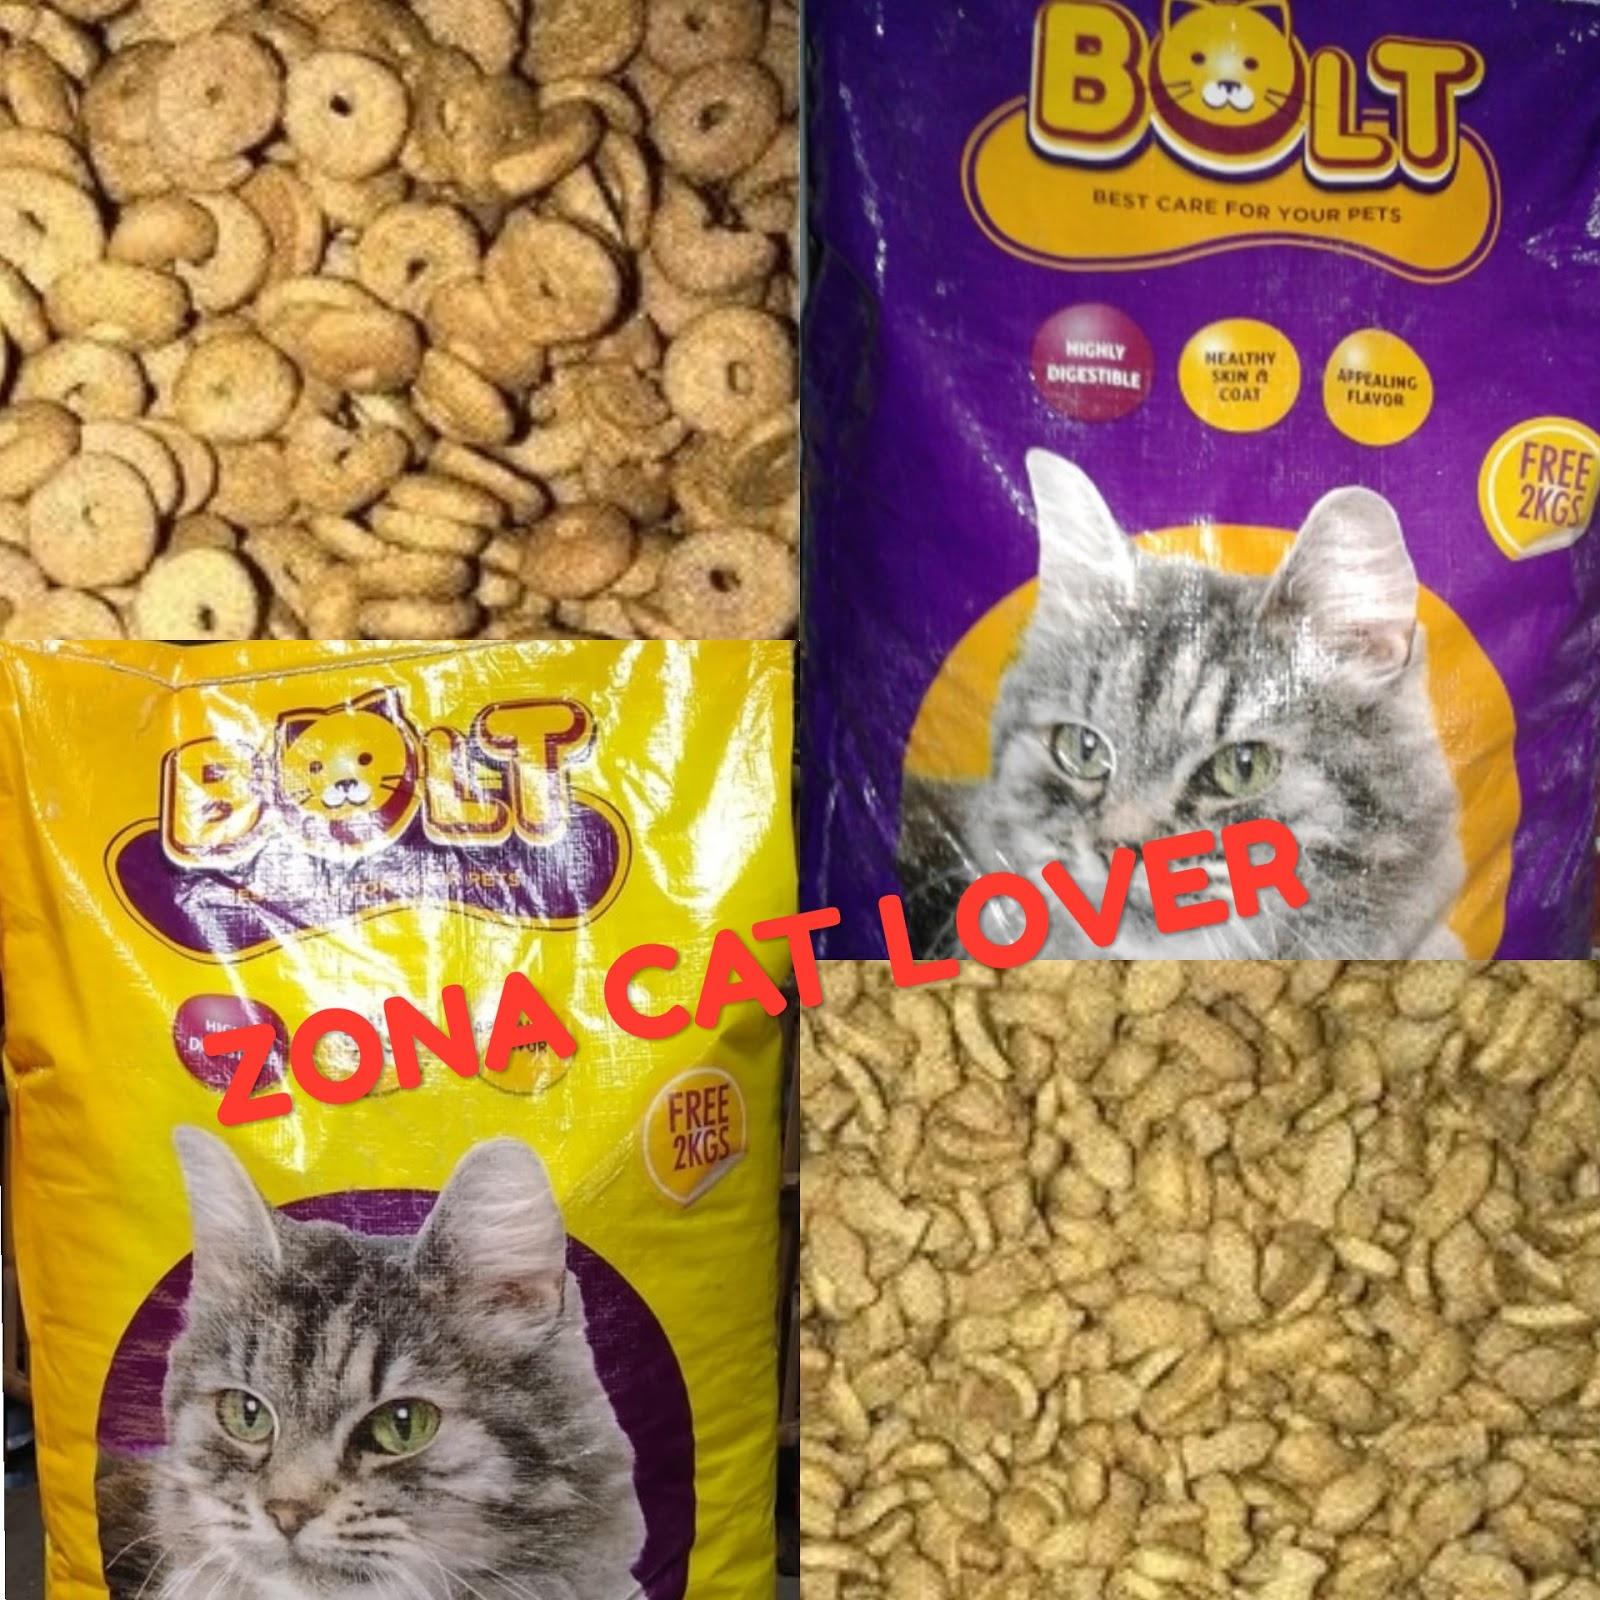 Zona Cat Lover Review Makanan Kucing Bolt